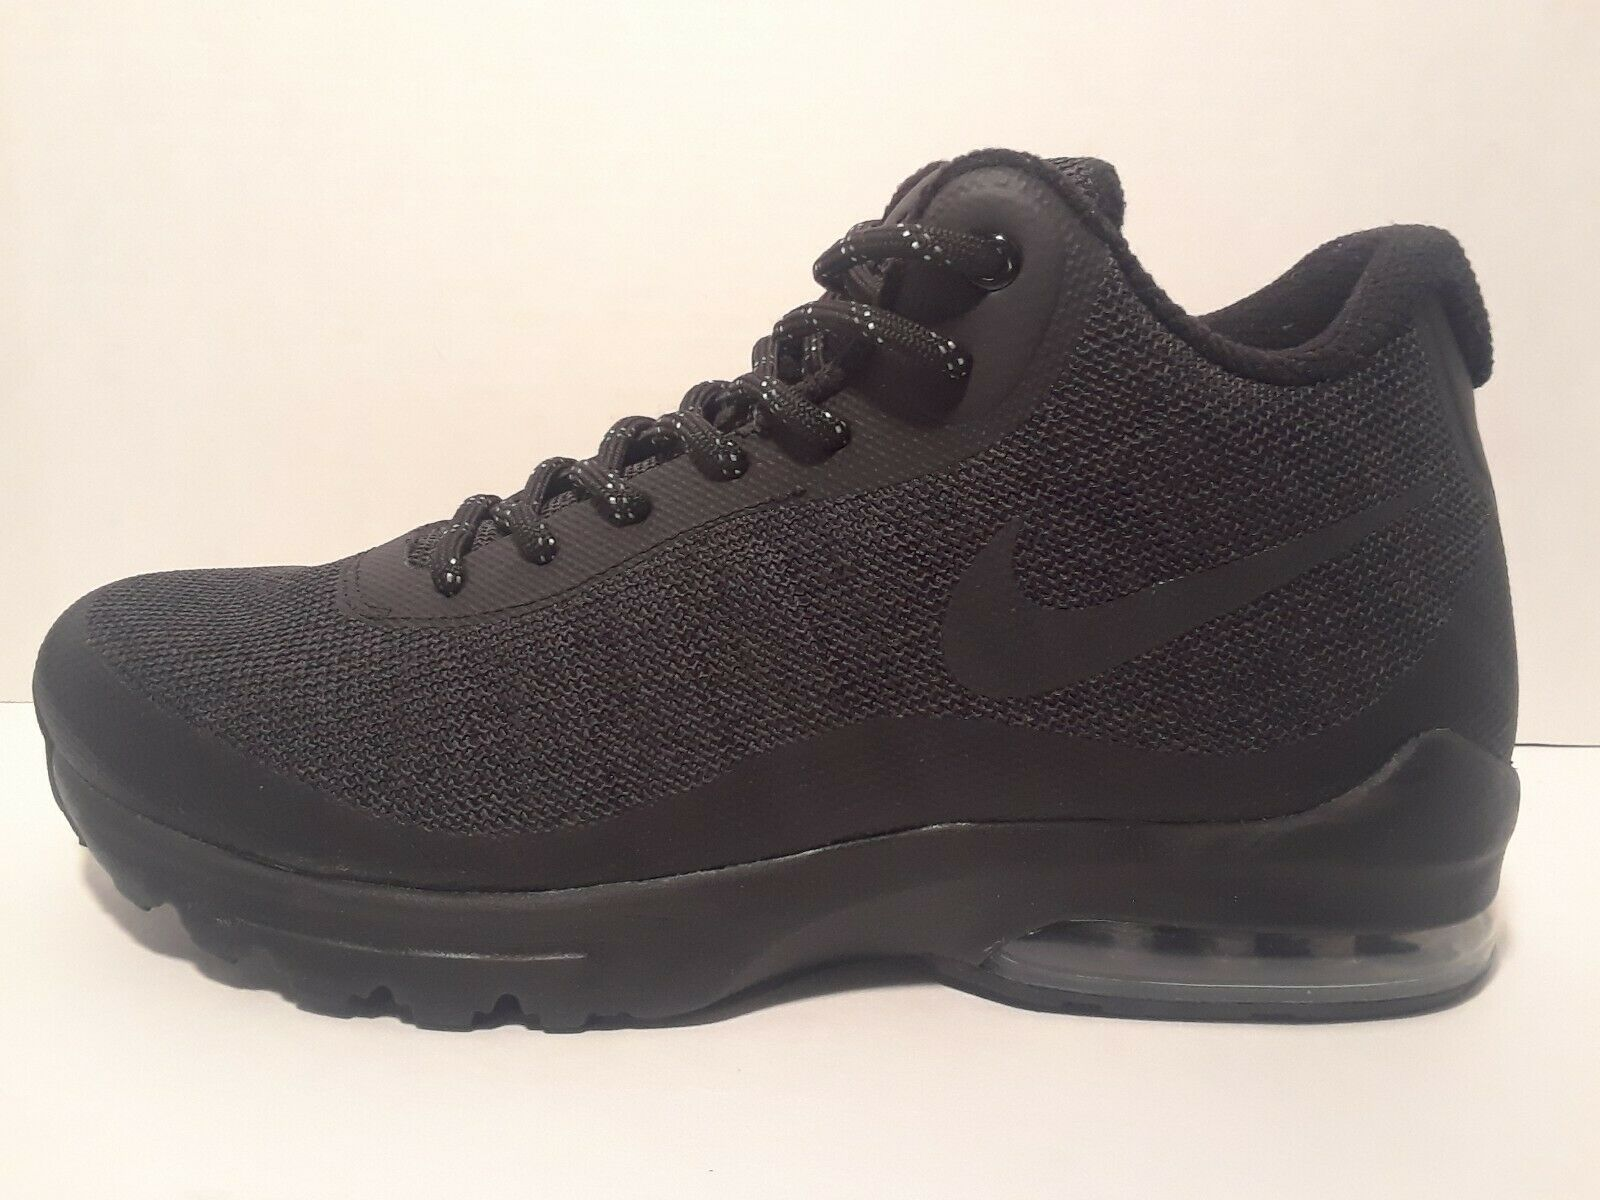 Nike Air Max Invigor Mens Black  Size 9  shoes